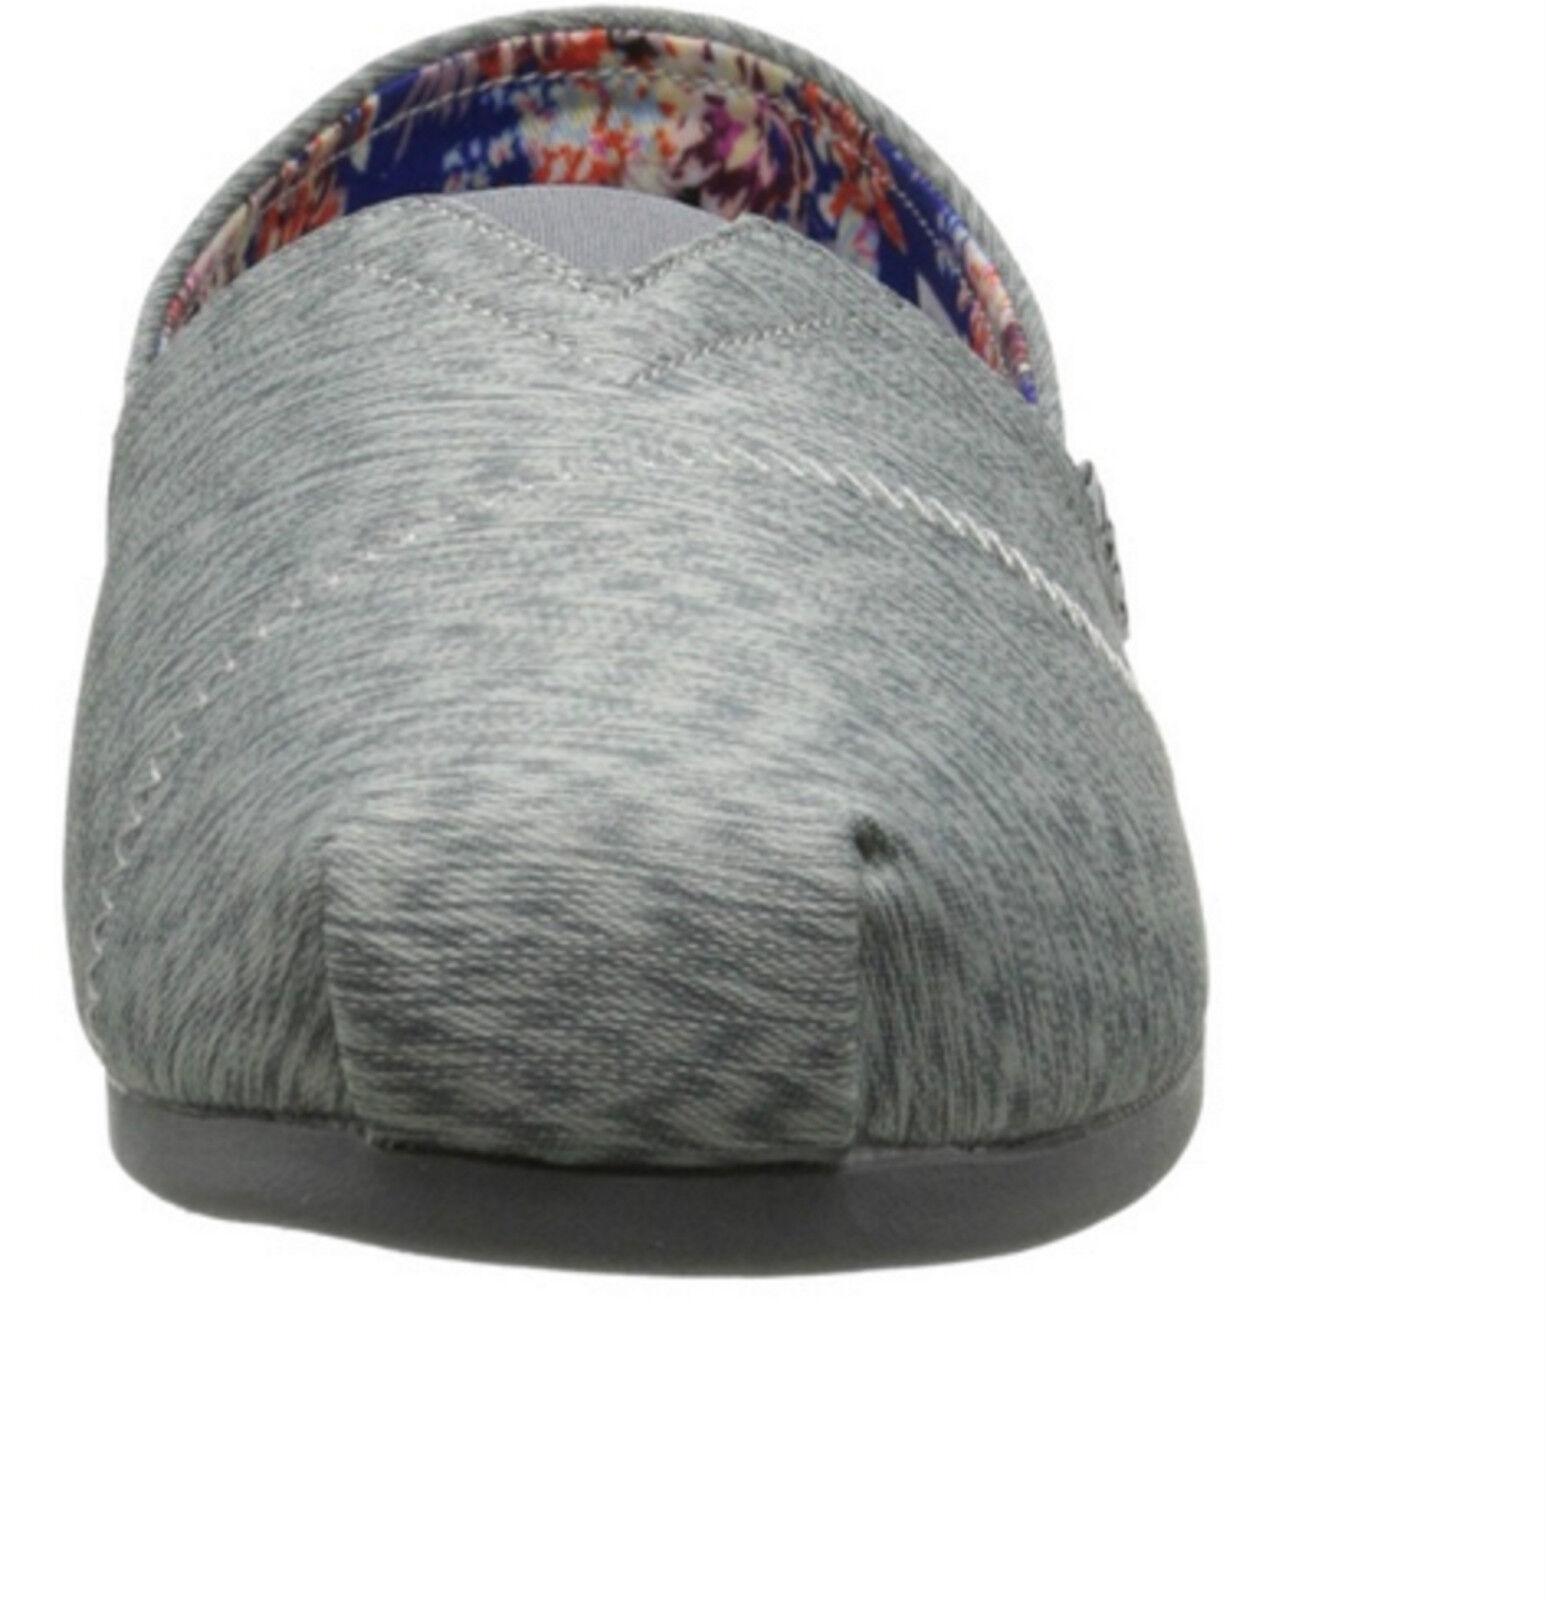 BOBS Foam Skechers Damens Plush Kaleidoscope Flat Gray Schuhes Memory Foam BOBS Flexible Gift 40c4fc